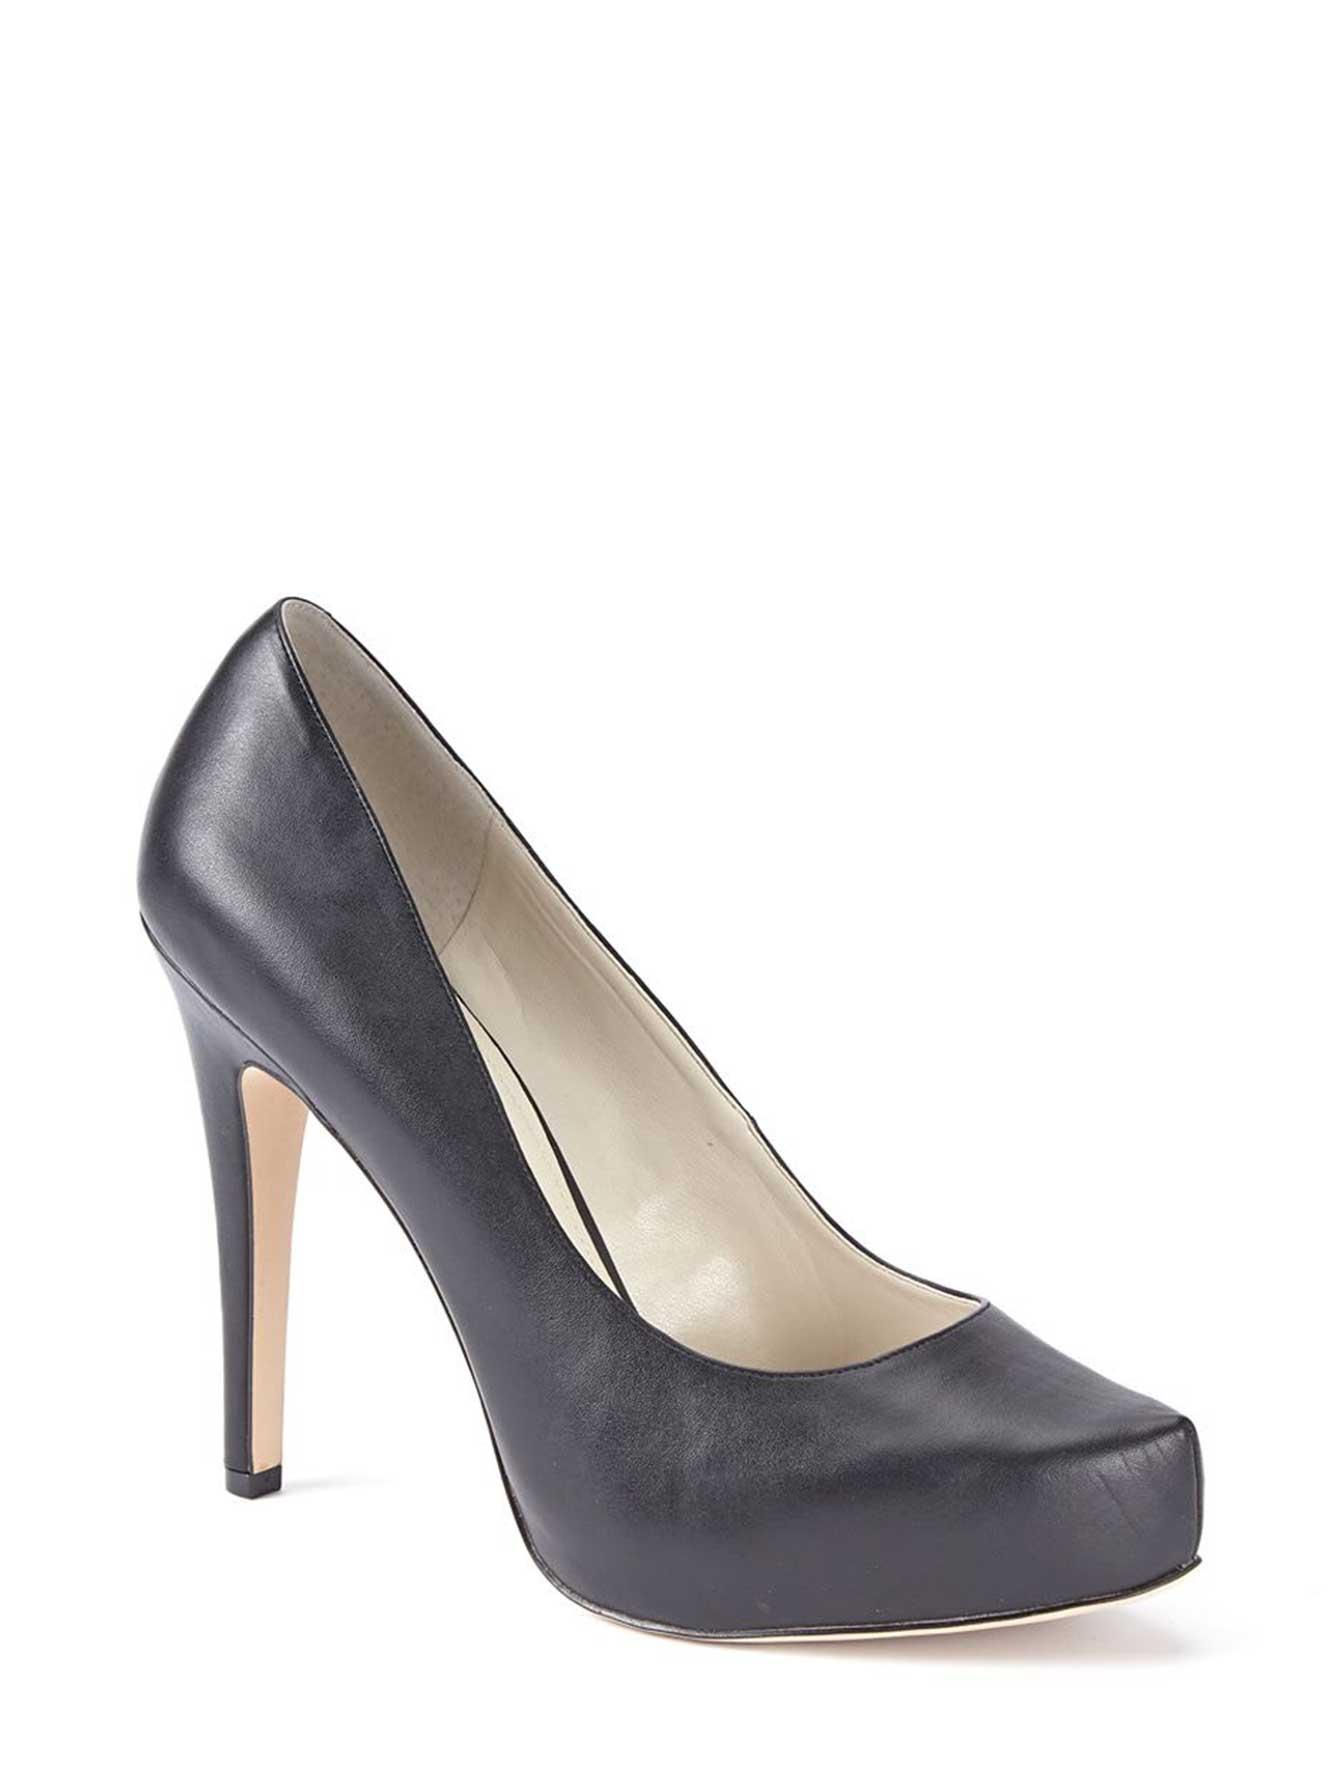 talon BCBG Addition Elle à Chaussures wYf5qp6xOx